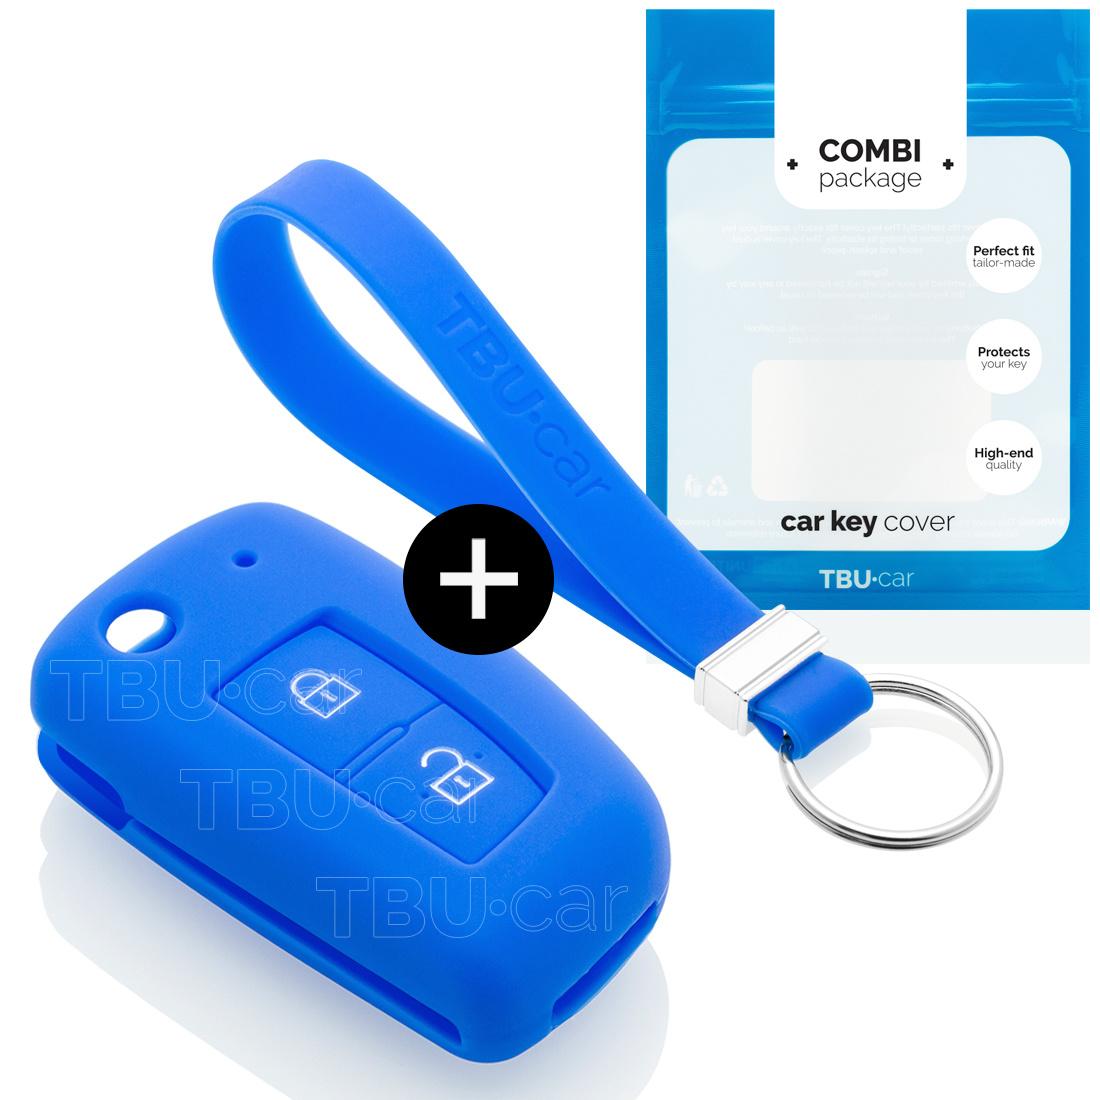 TBU car TBU car Sleutel cover compatibel met Nissan - Silicone sleutelhoesje - beschermhoesje autosleutel - Blauw